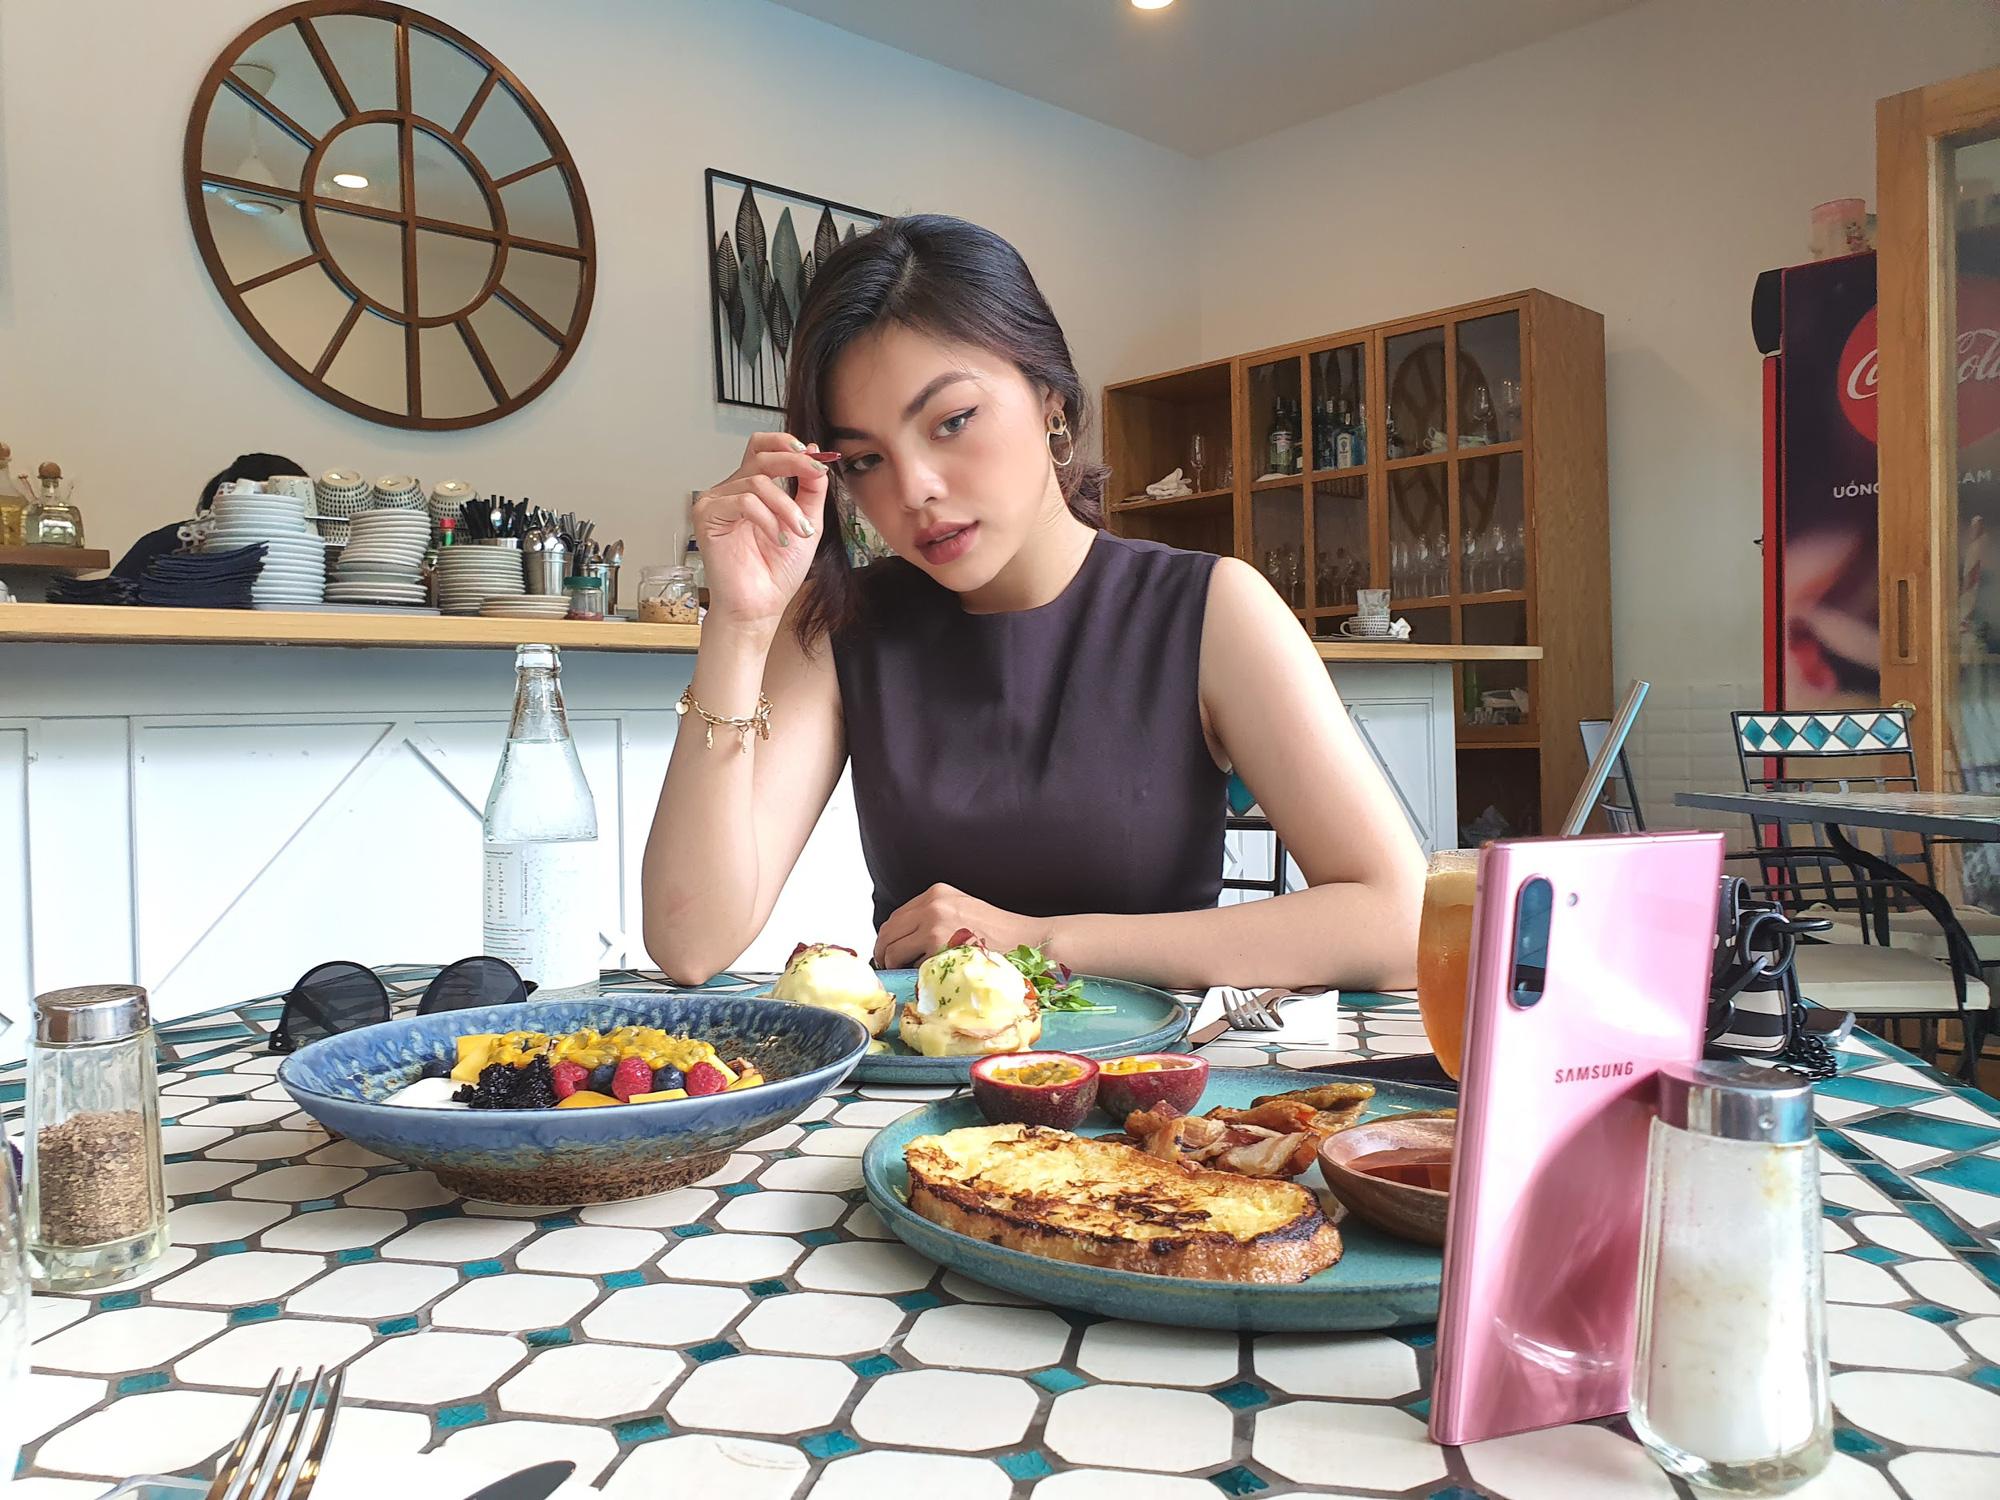 bi kip chup do an ngon nhu anh cua food blogger tren instagram